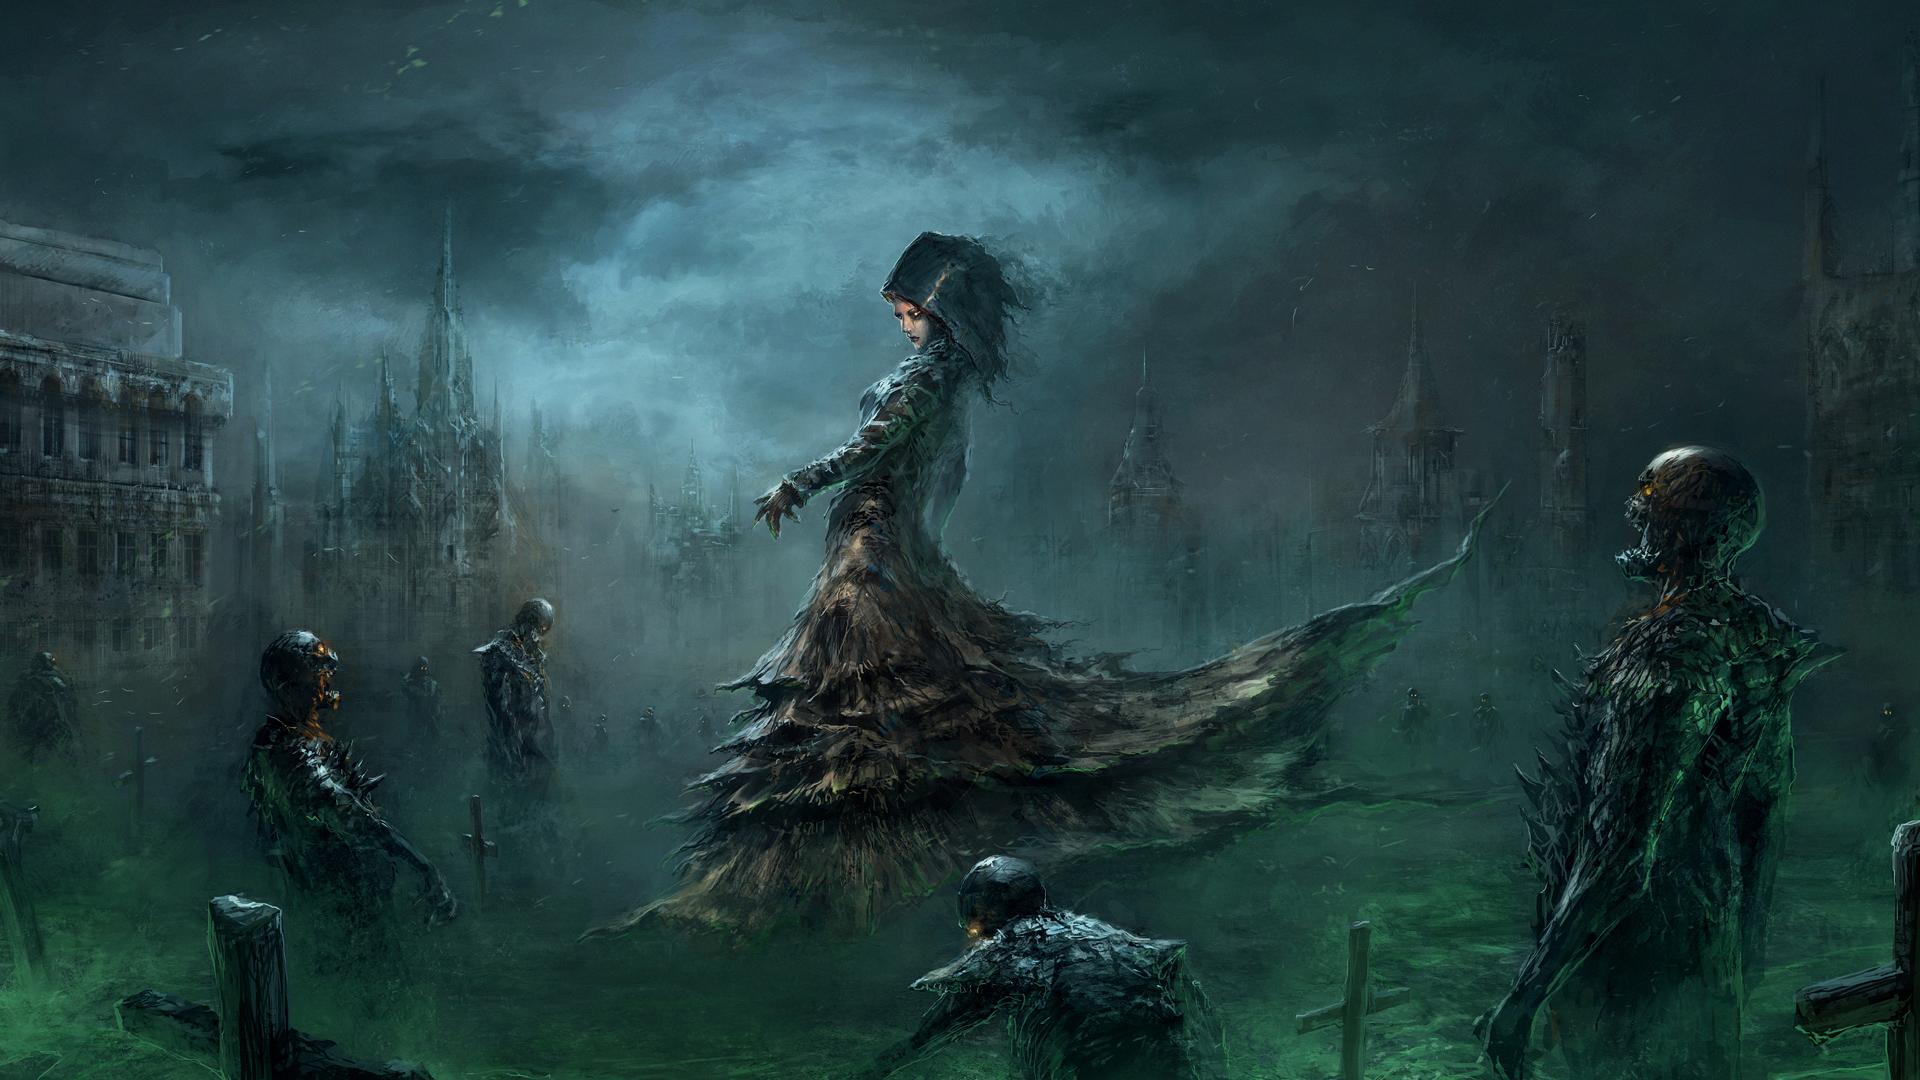 Fantasy Art Necromancers Wallpapers Hd Desktop And: Banshee Tapeta HD